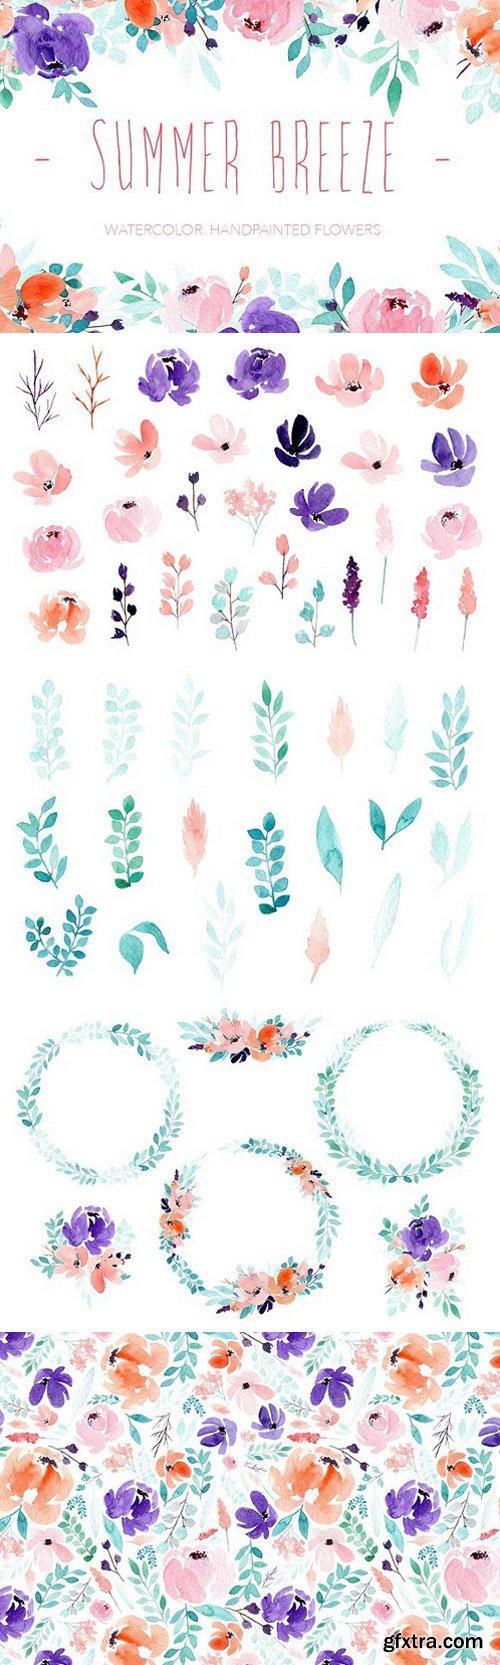 Summer Breeze - Watercolor flowers